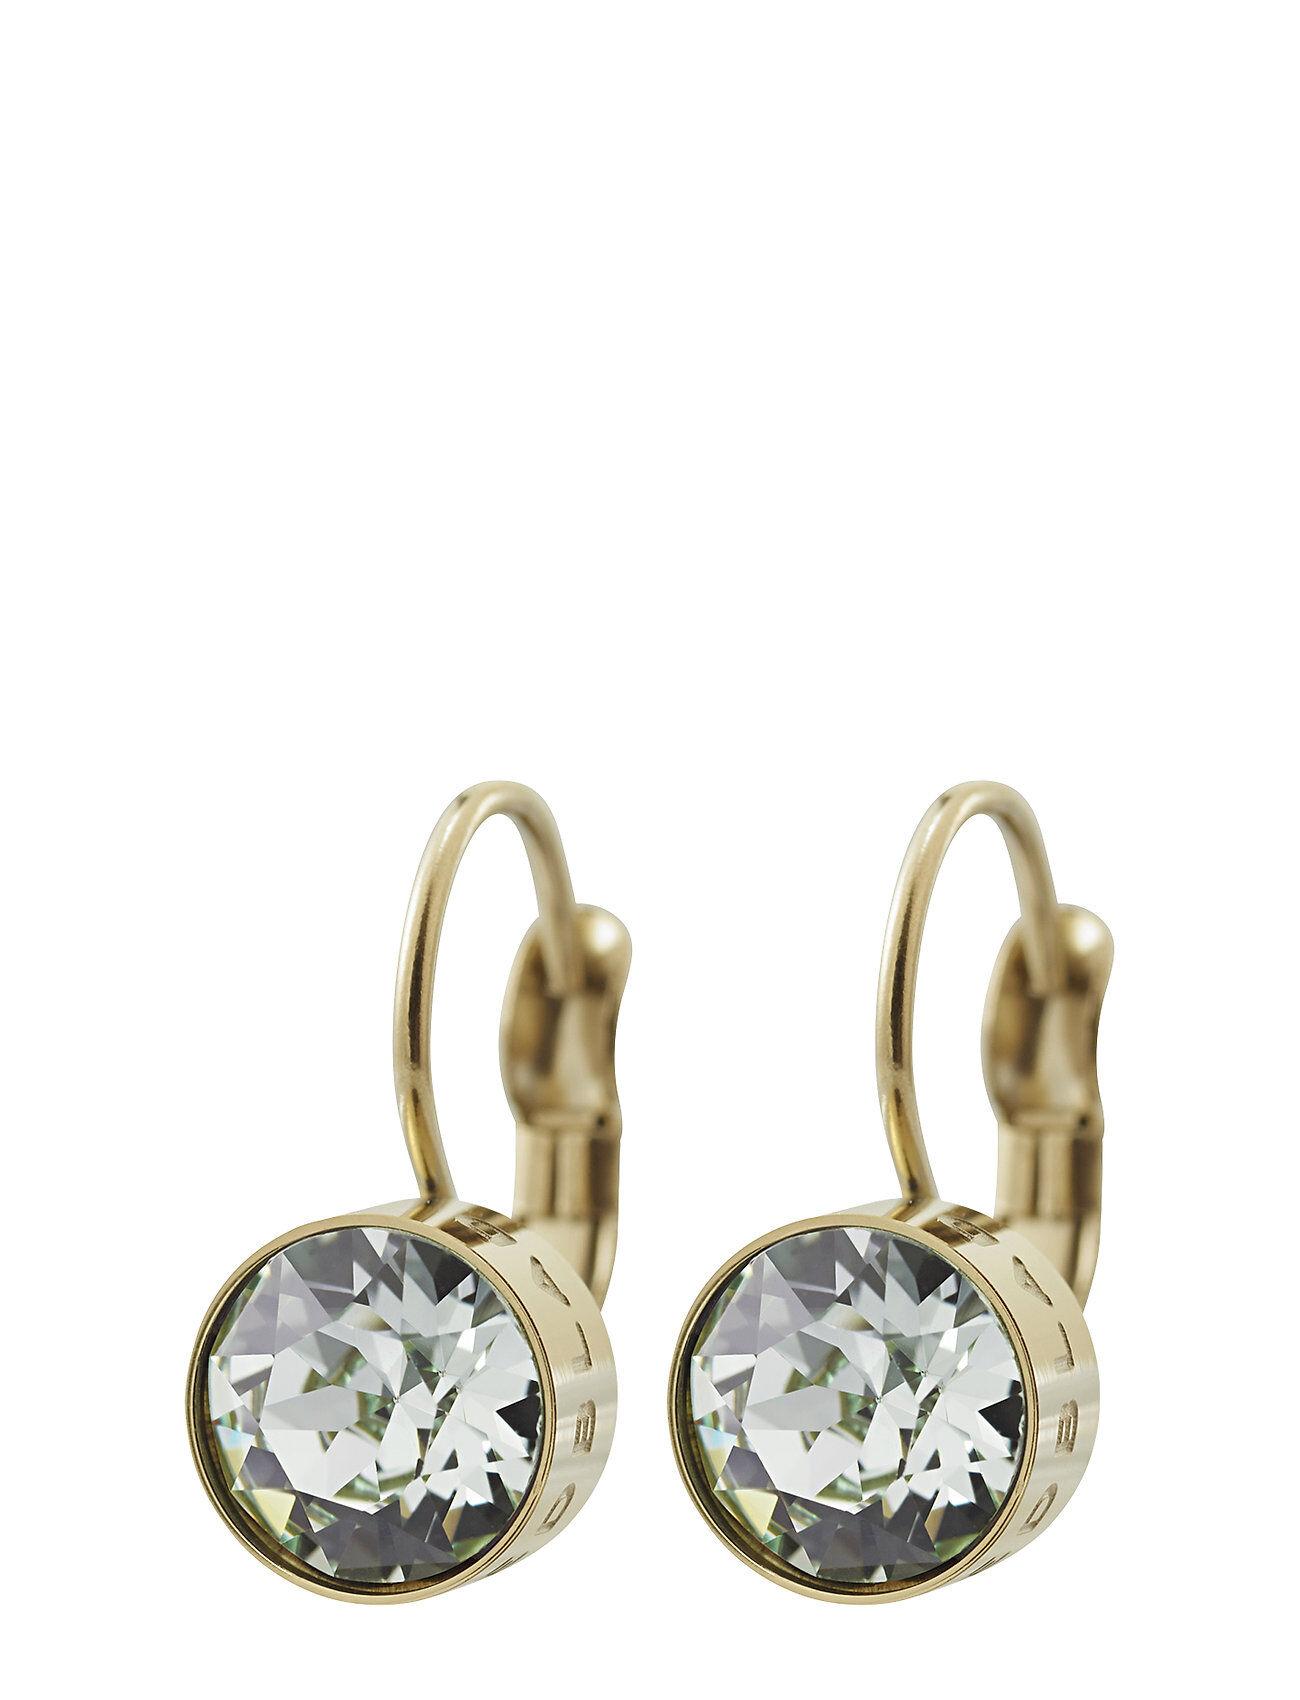 Edblad Diana Earrings Pool Blue Crystal Gold Accessories Jewellery Earrings Hoops Kulta Edblad